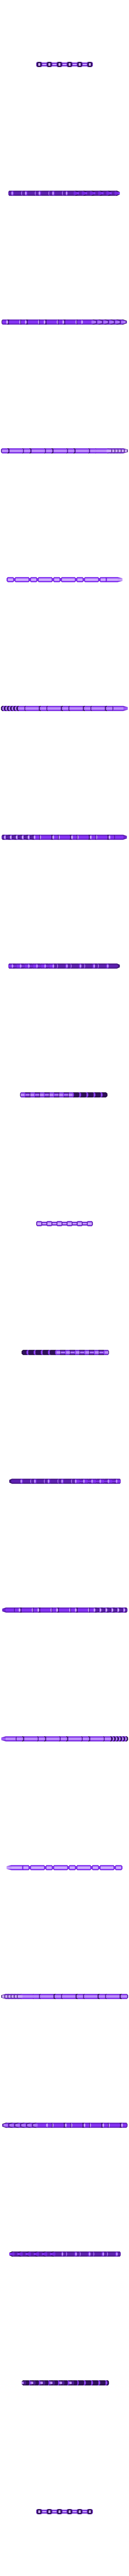 ZDungeon_DoorTab_A.stl Download free STL file ZDungeon (experimental dungeon tiles) • 3D printable object, Dutchmogul